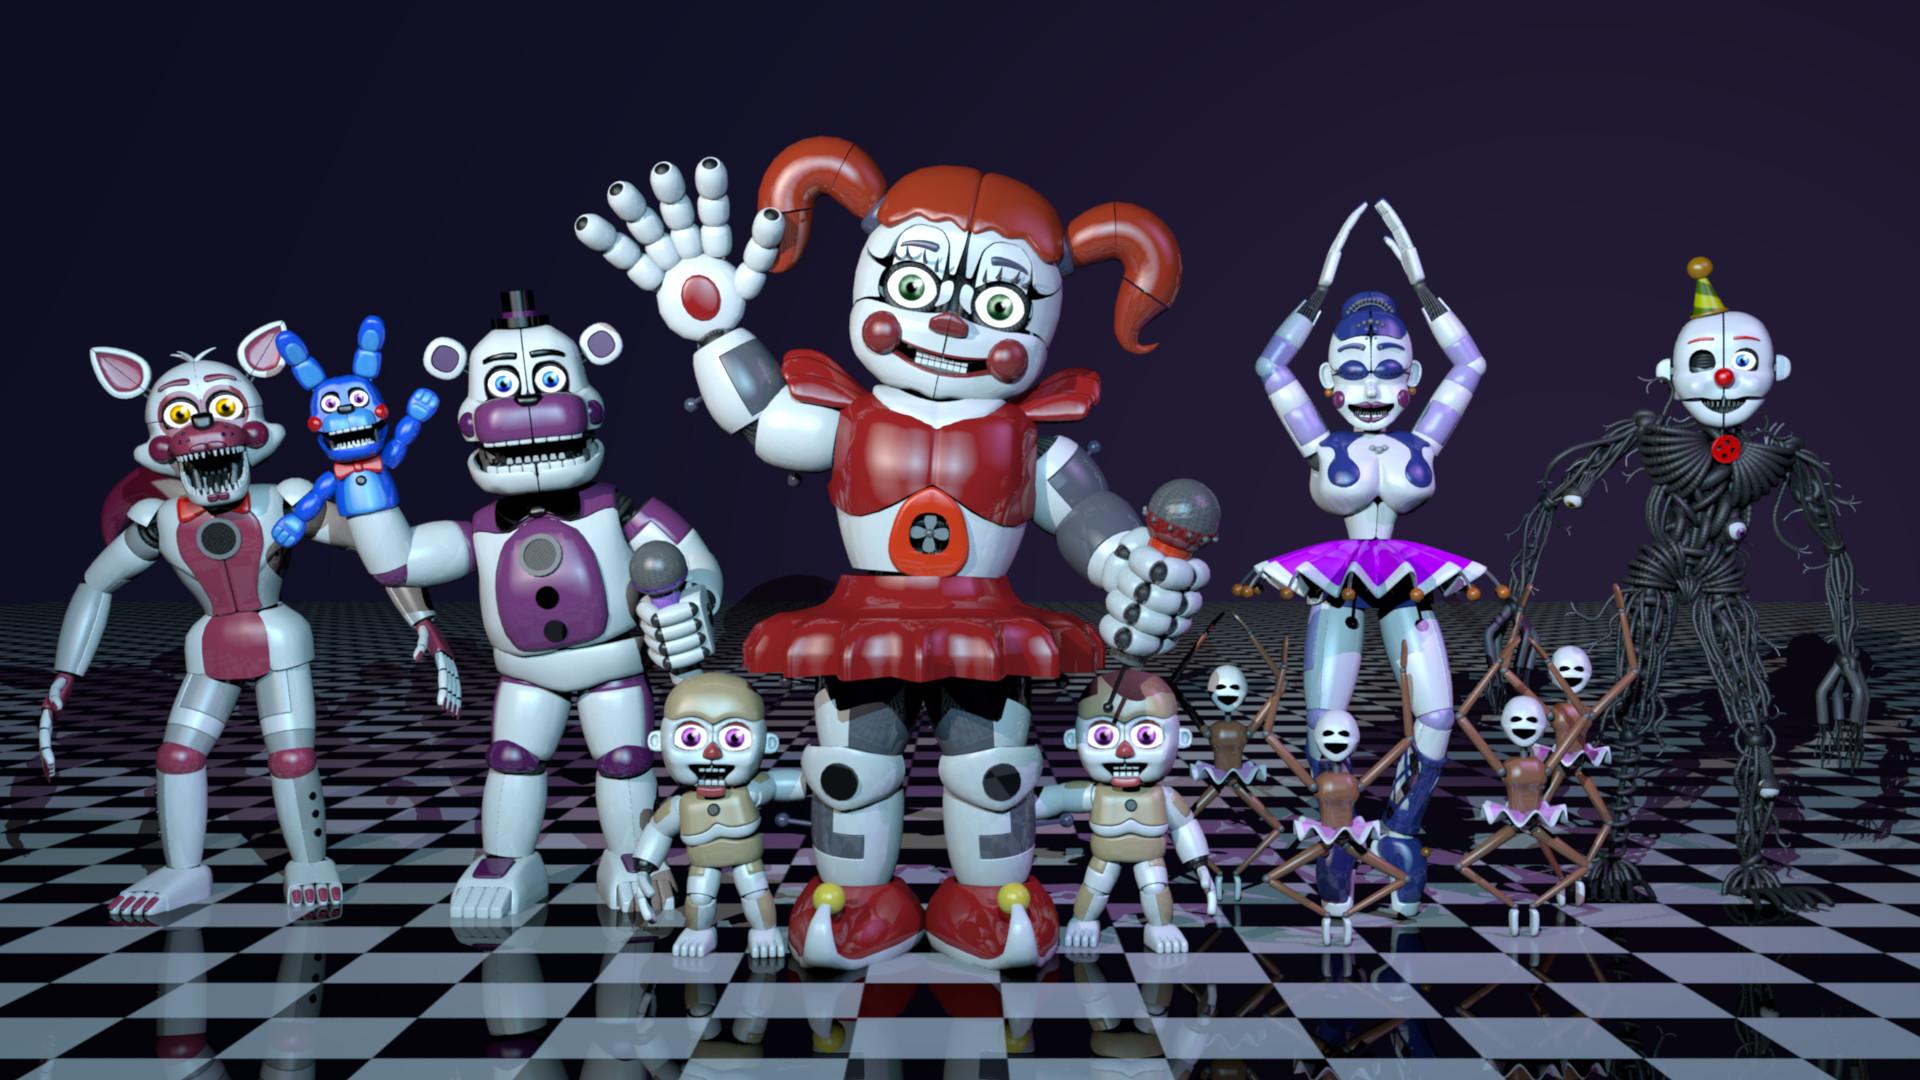 ArtStation - Five Nights at Freddy's: Sister Location Fan-Made